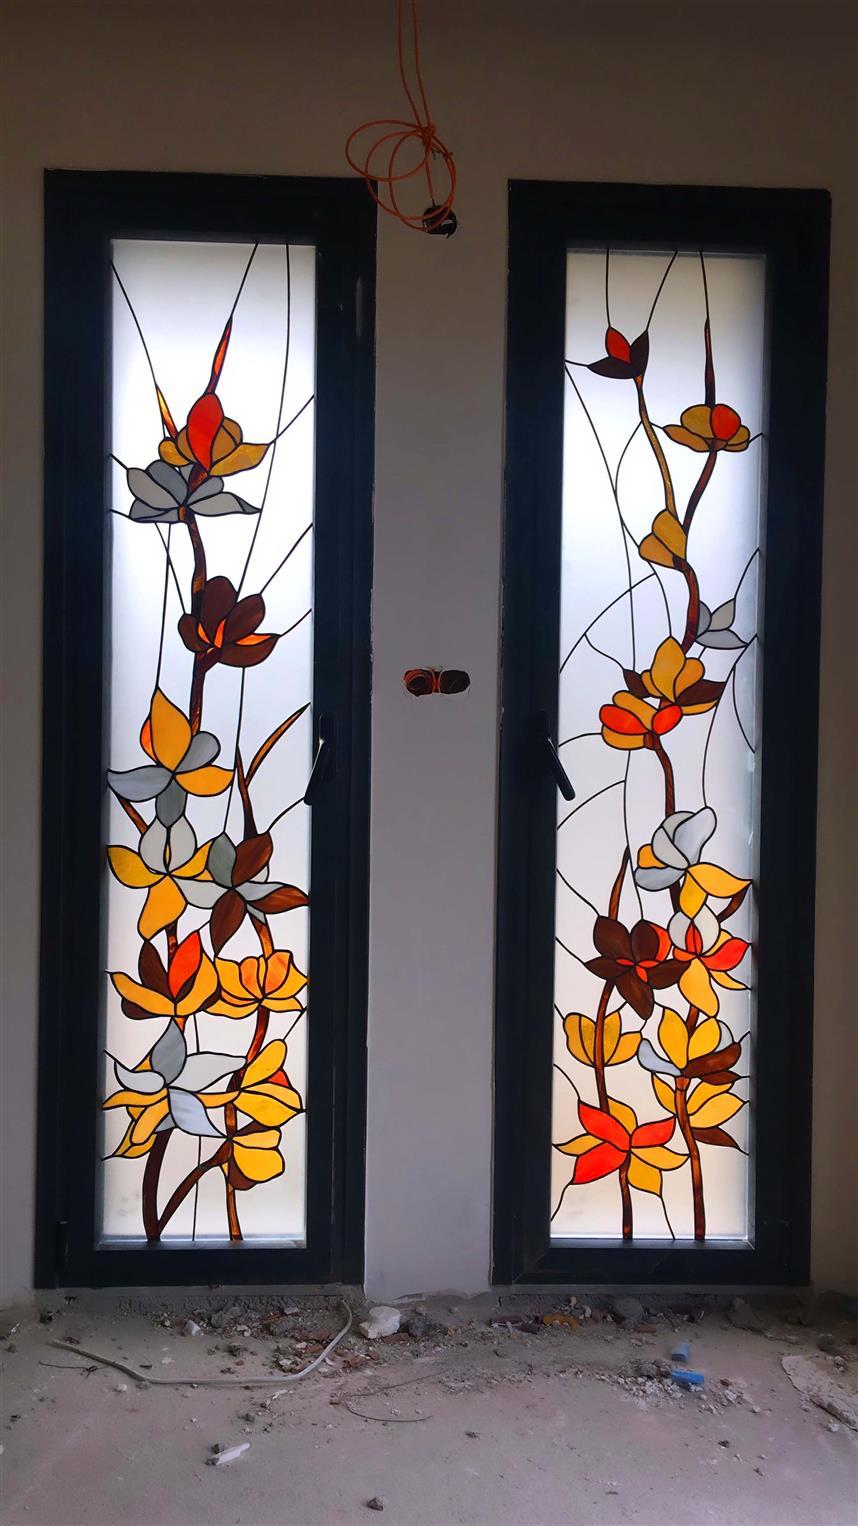 limanreis-narlidere-villa2020120182131222.jpg izmir vitray çalışması